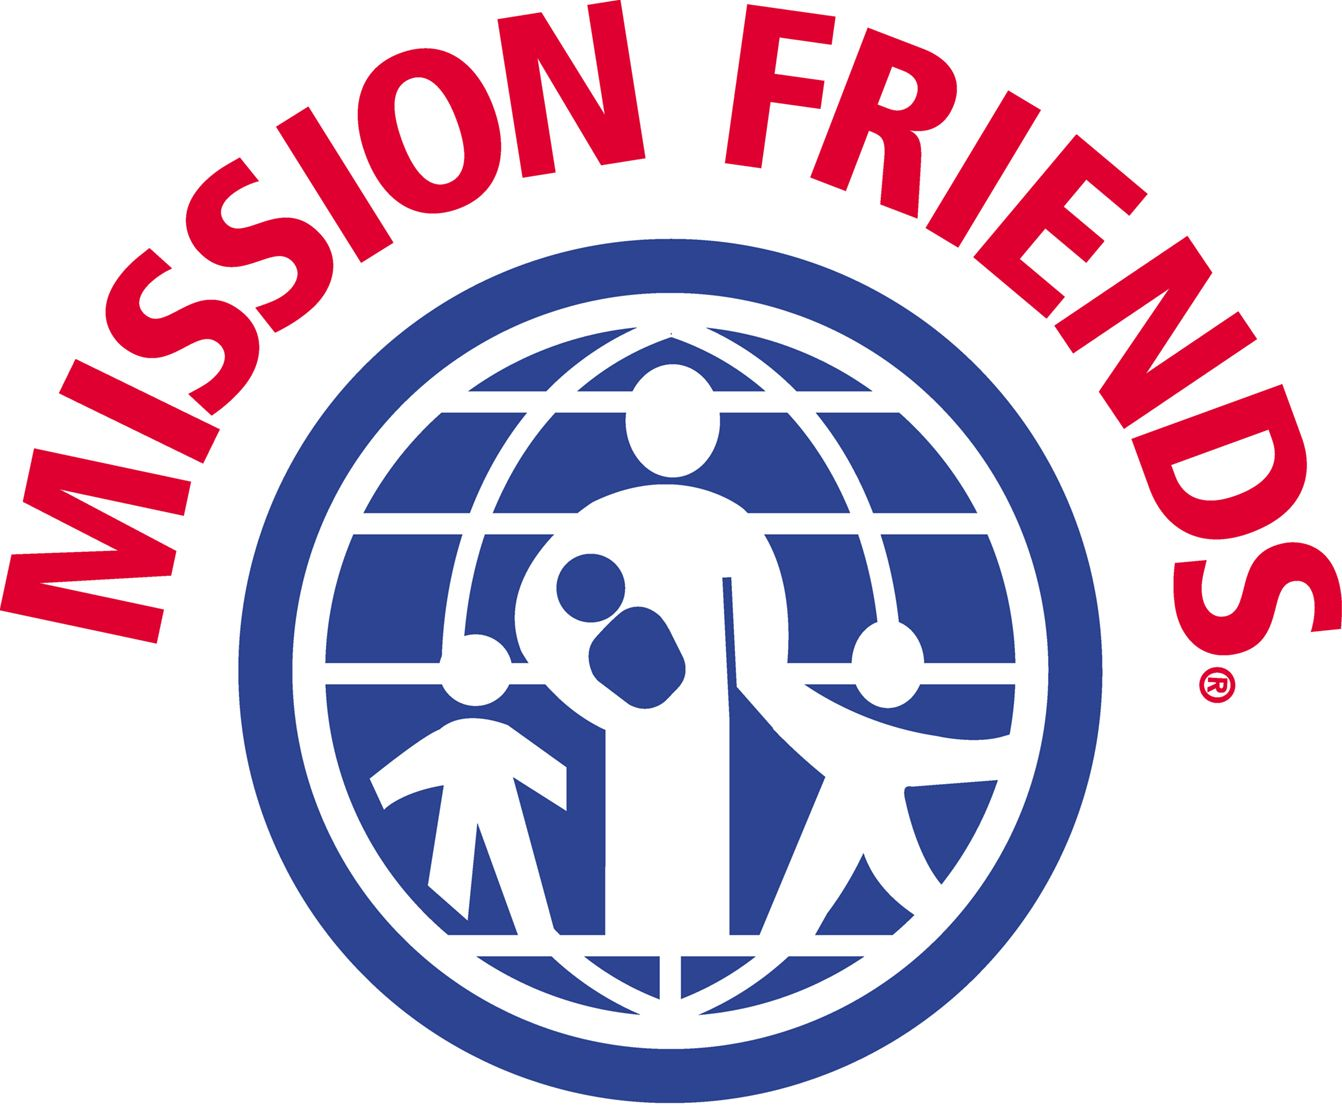 Mission Friends For Children